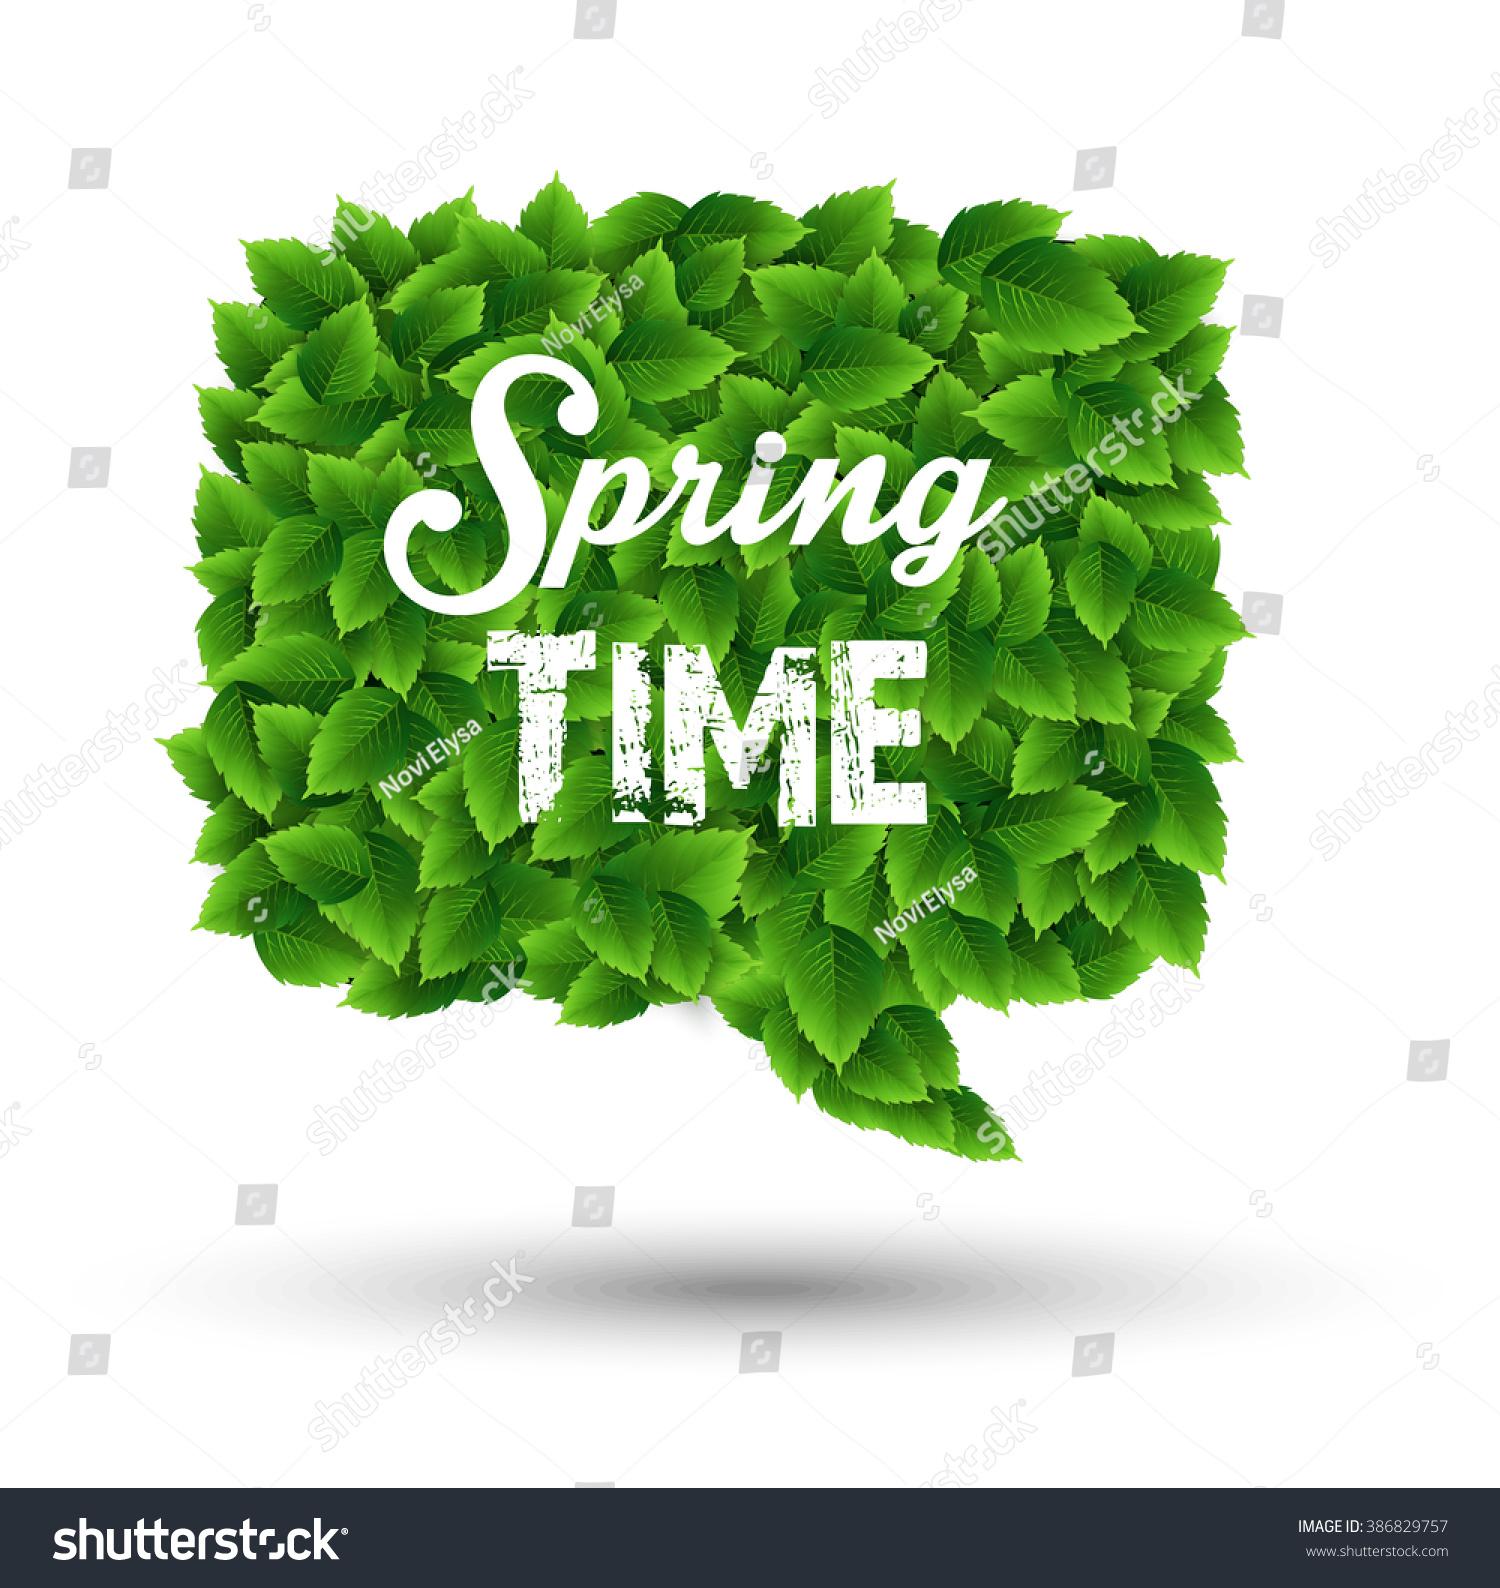 Springtime Greeting In A Speech Bubble Of Green Leavesctor Ez